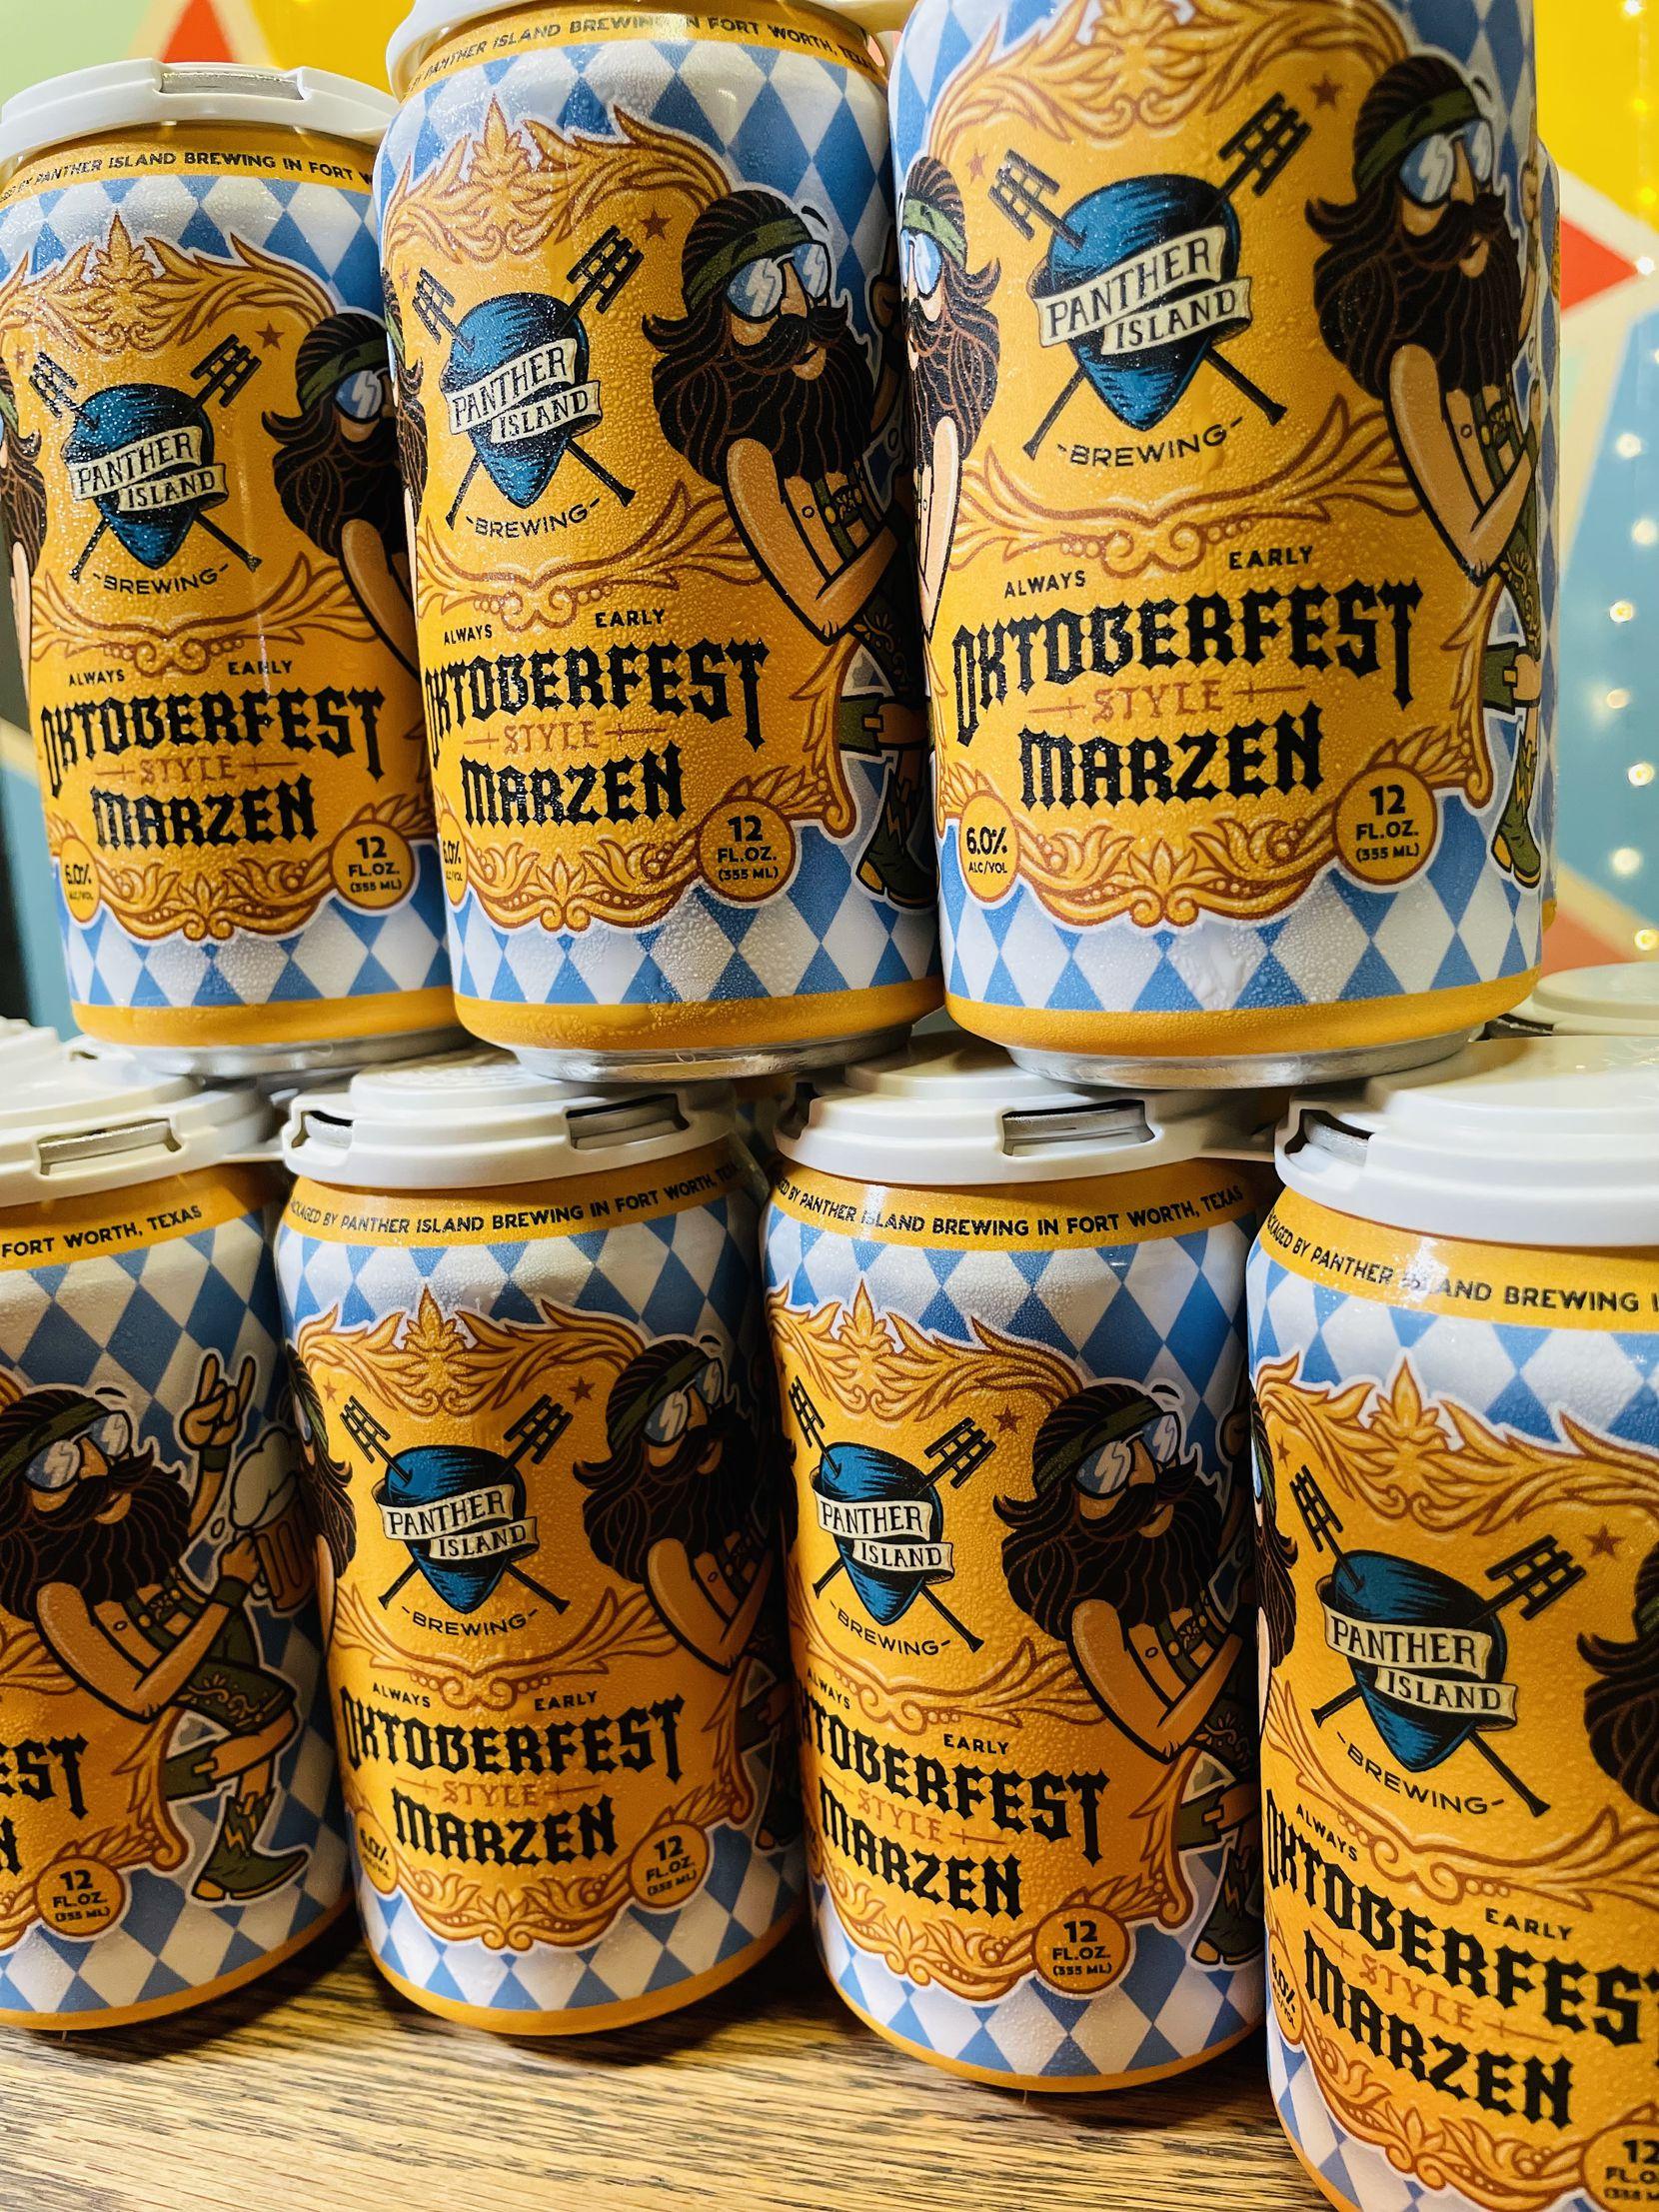 Oktoberfest-style marzen from Panther Island Brewing.